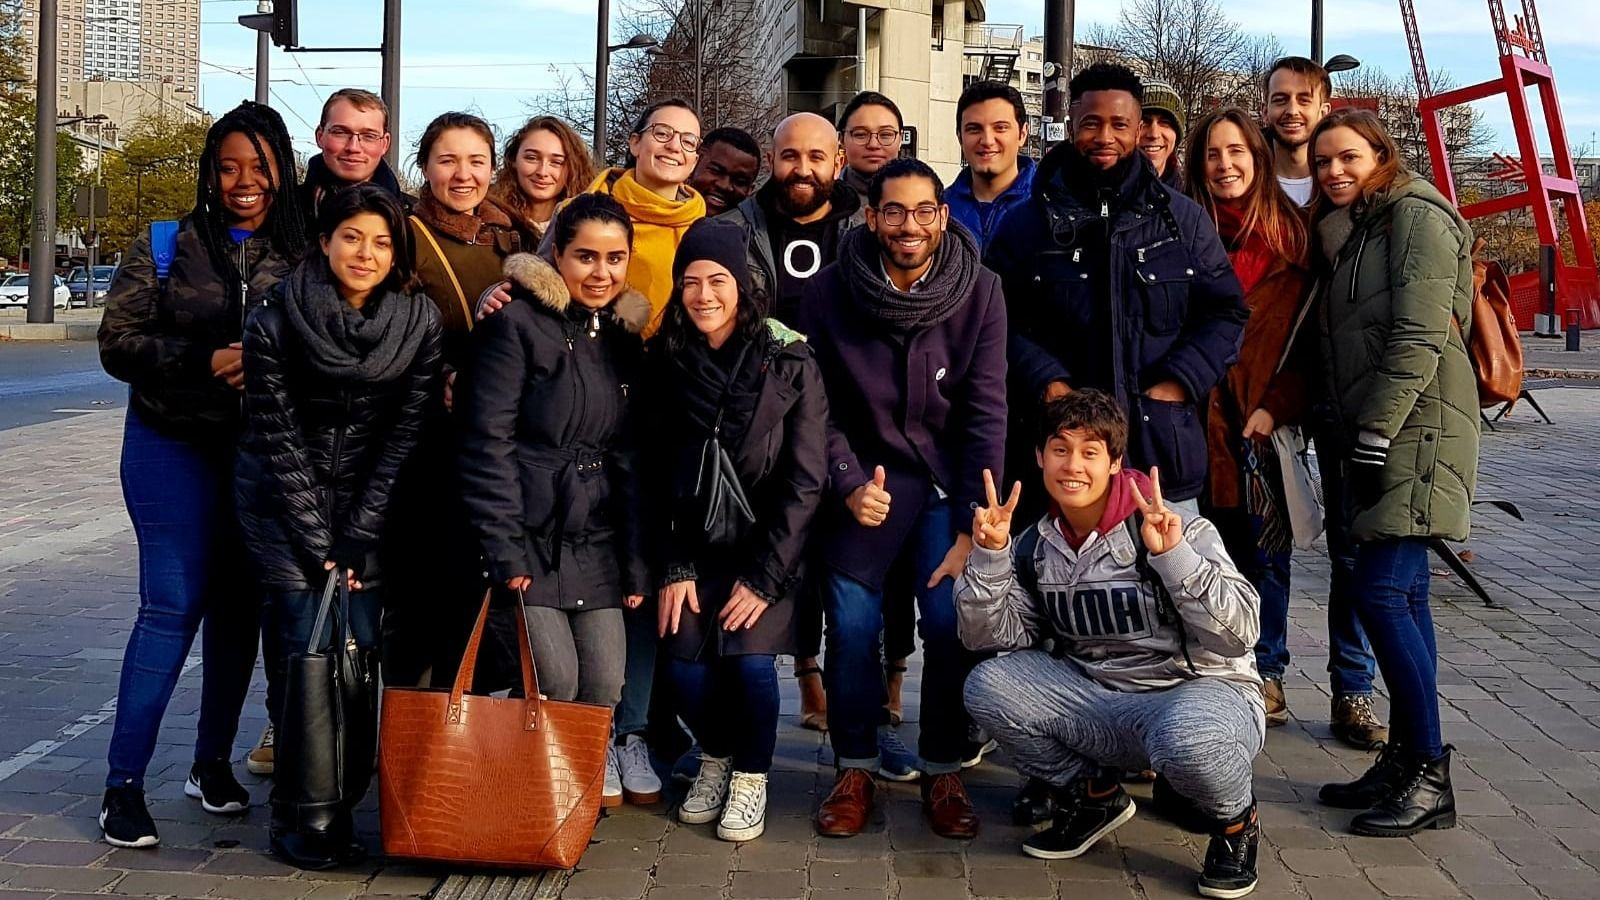 Serve the City Paris: Volunteer & Socialize with Expats!